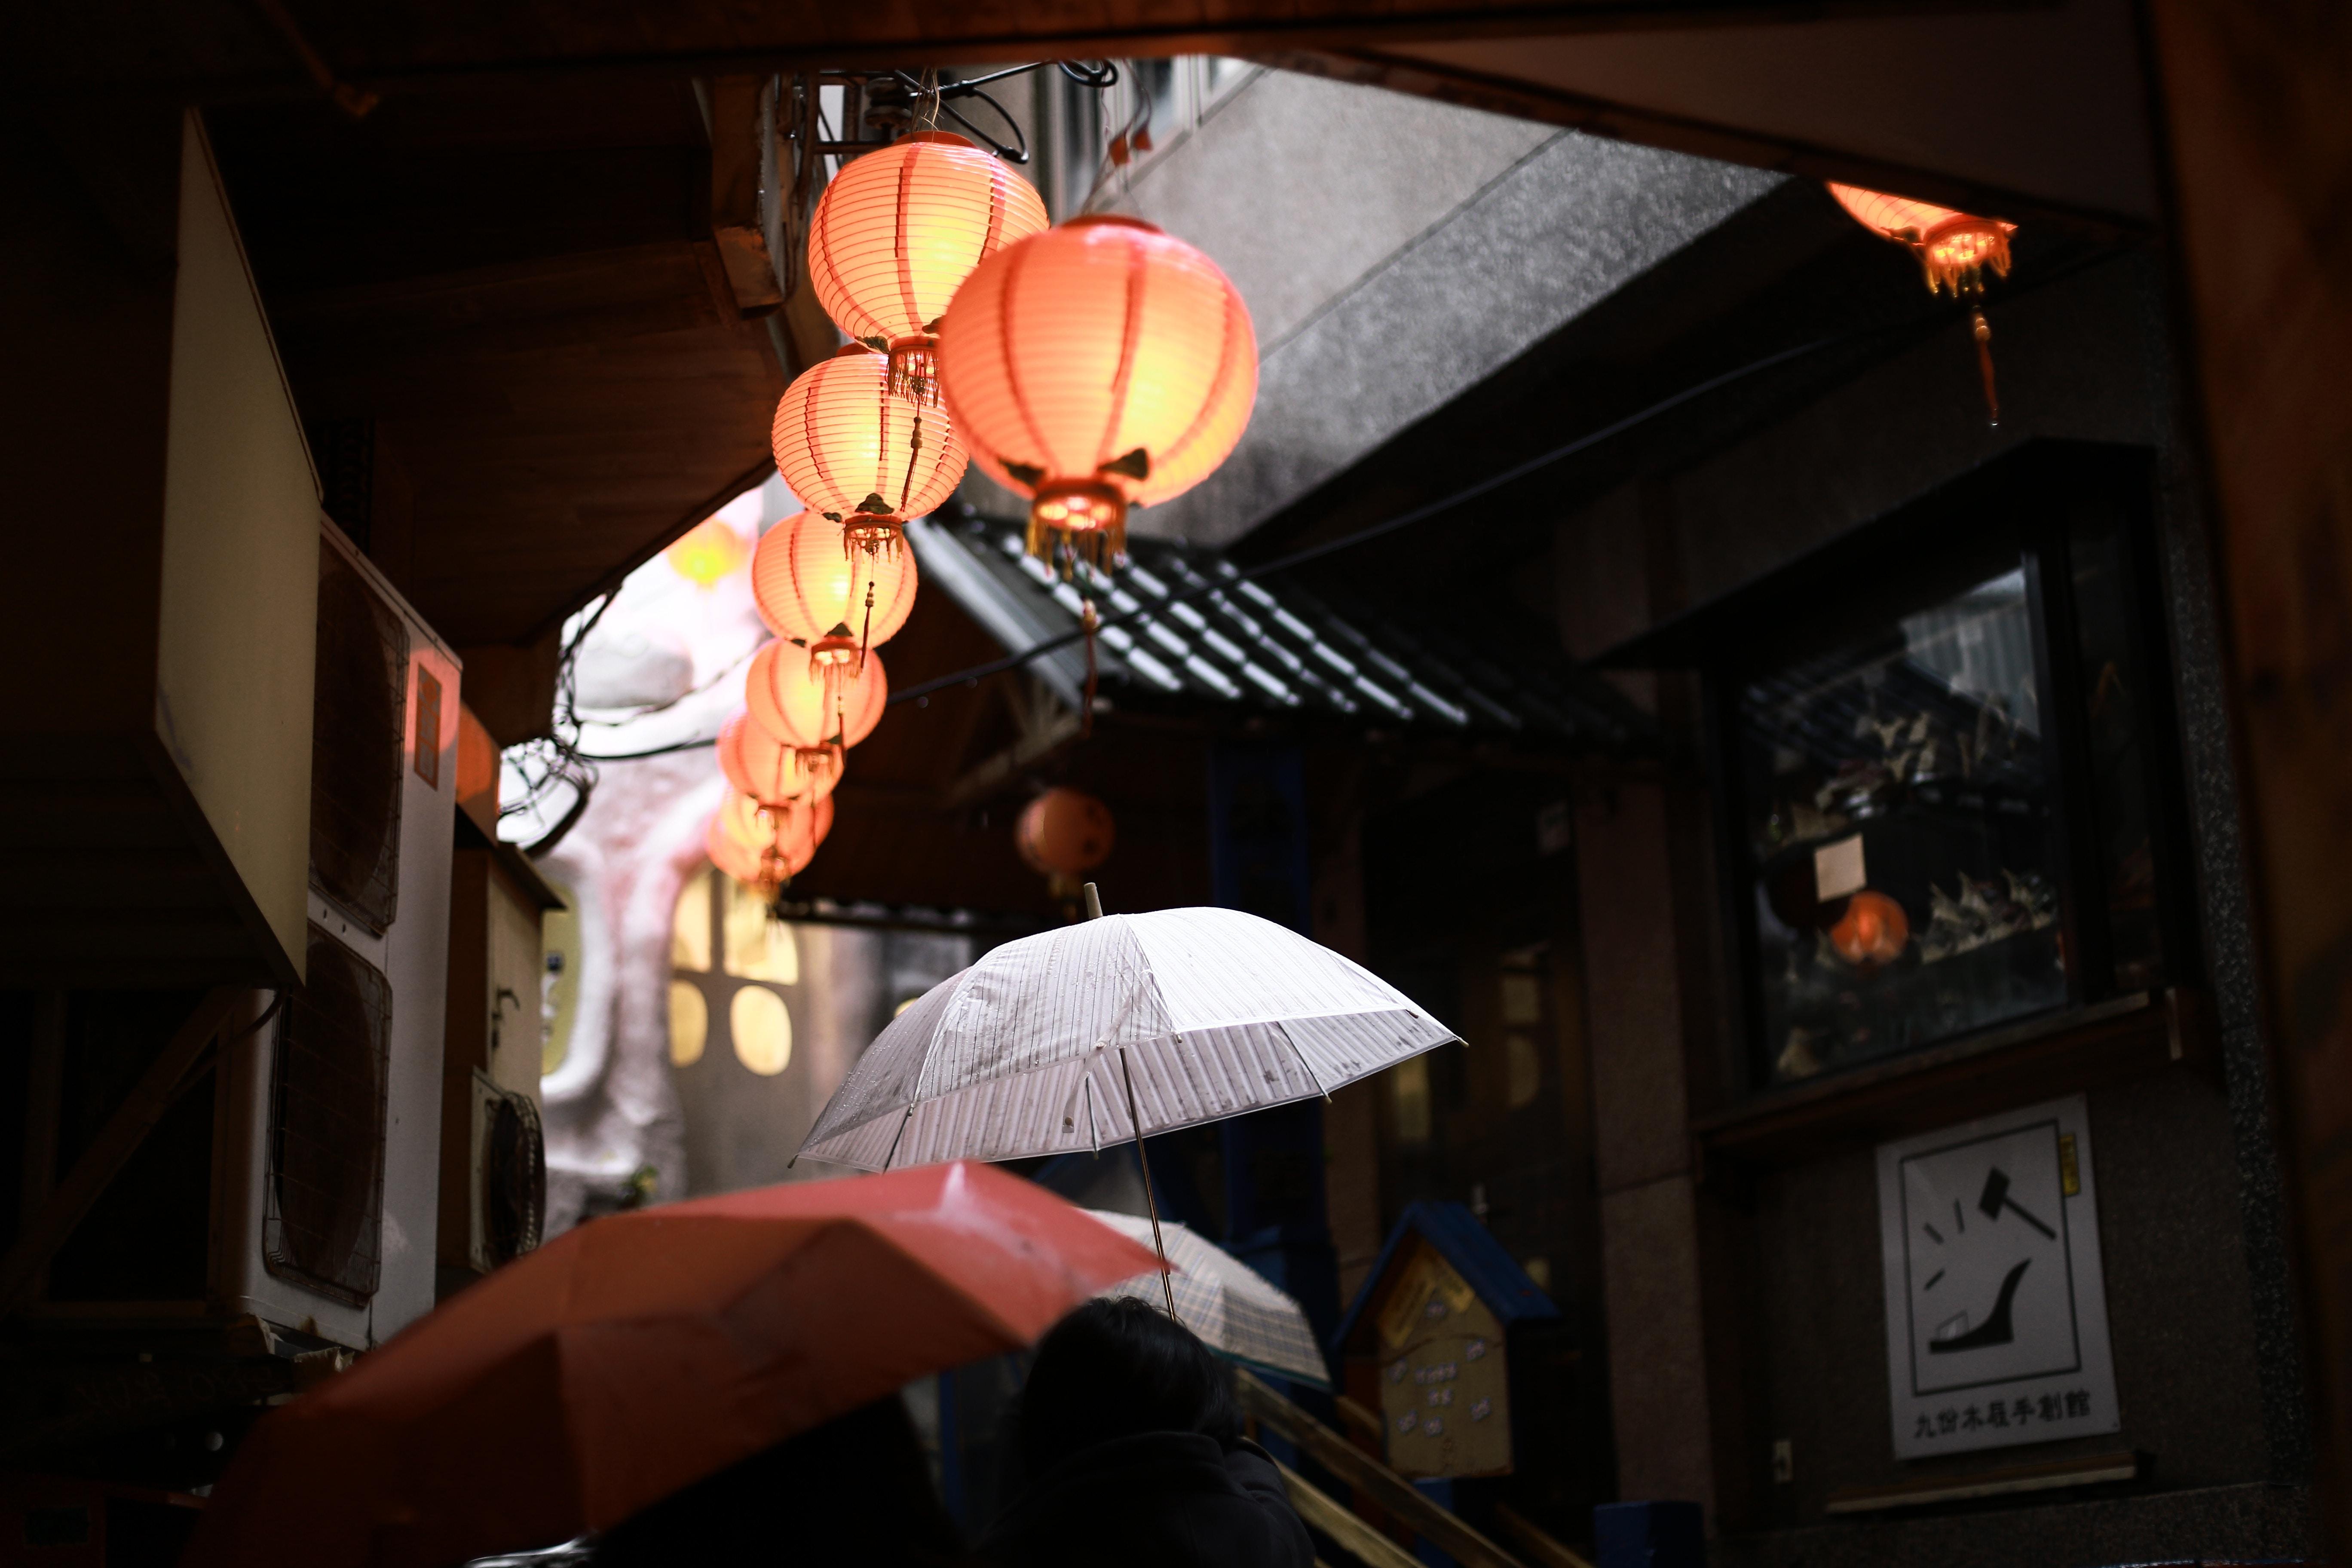 white handheld umbrella